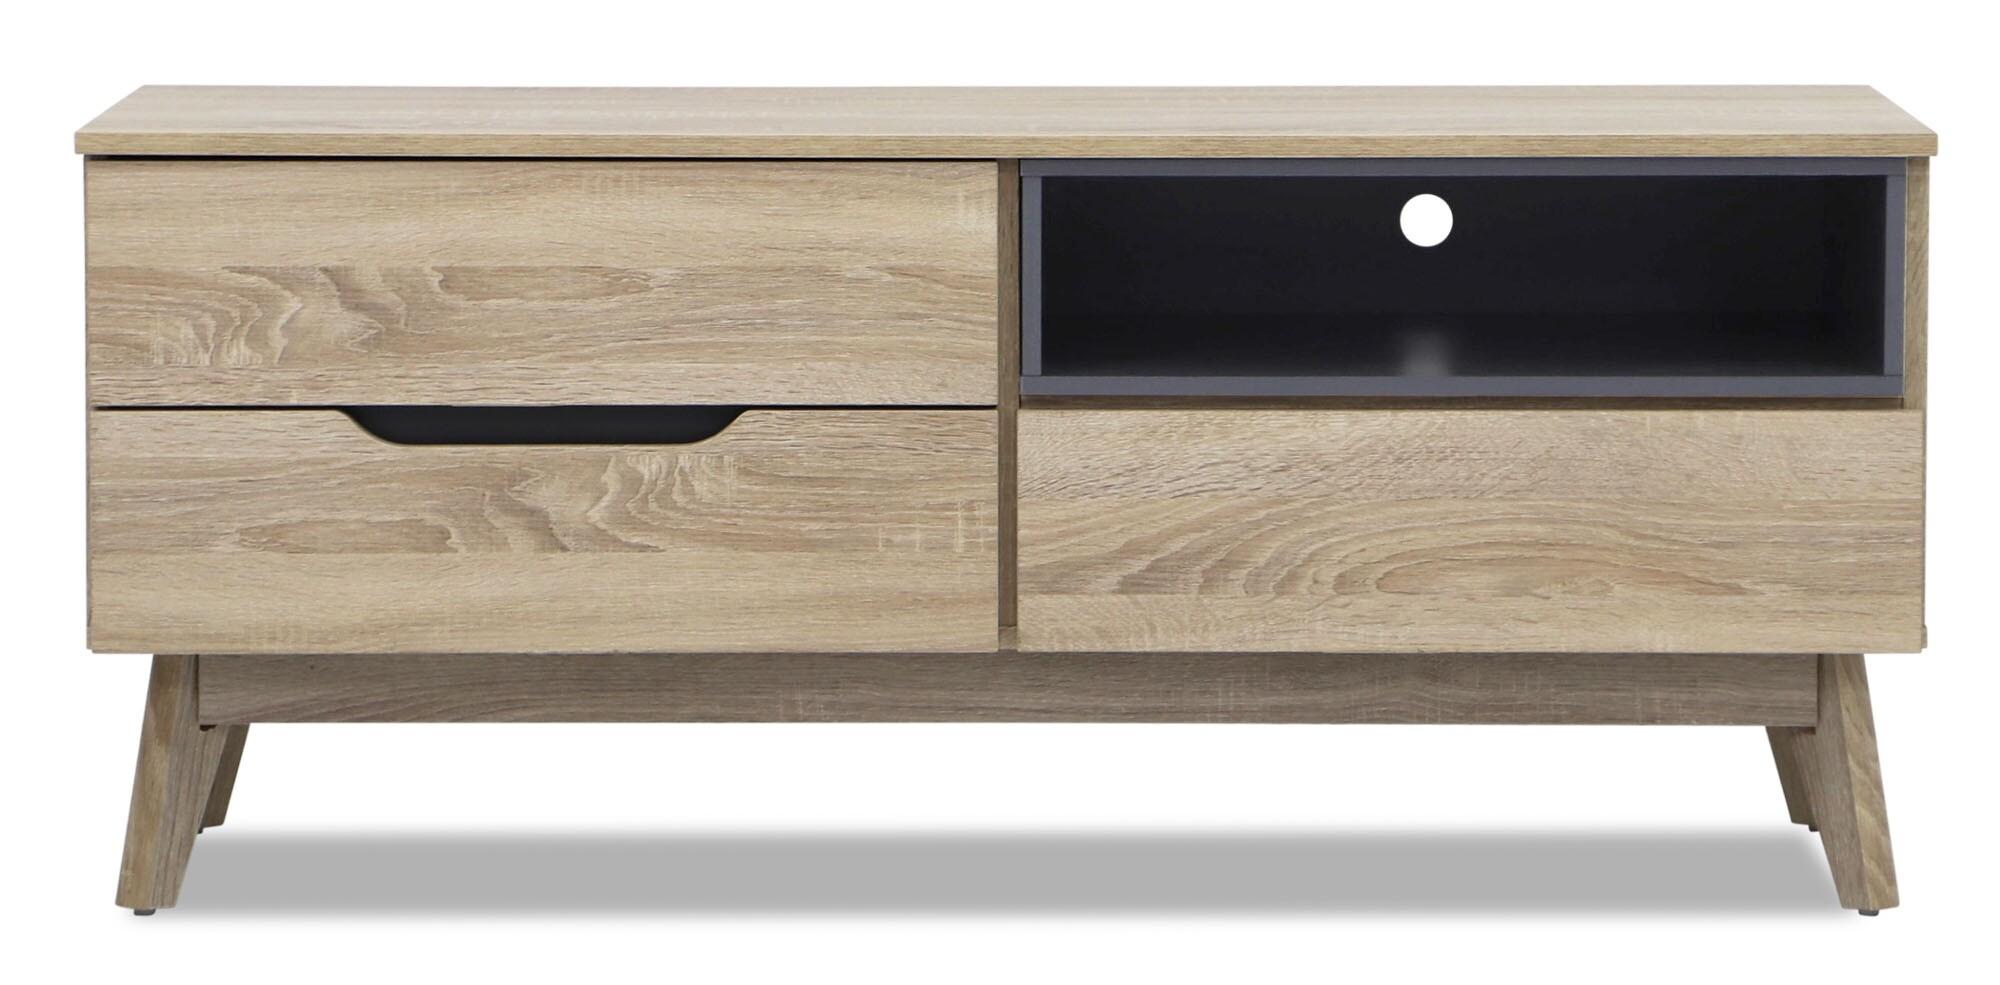 mikala petite tv console furniture home d cor fortytwo. Black Bedroom Furniture Sets. Home Design Ideas